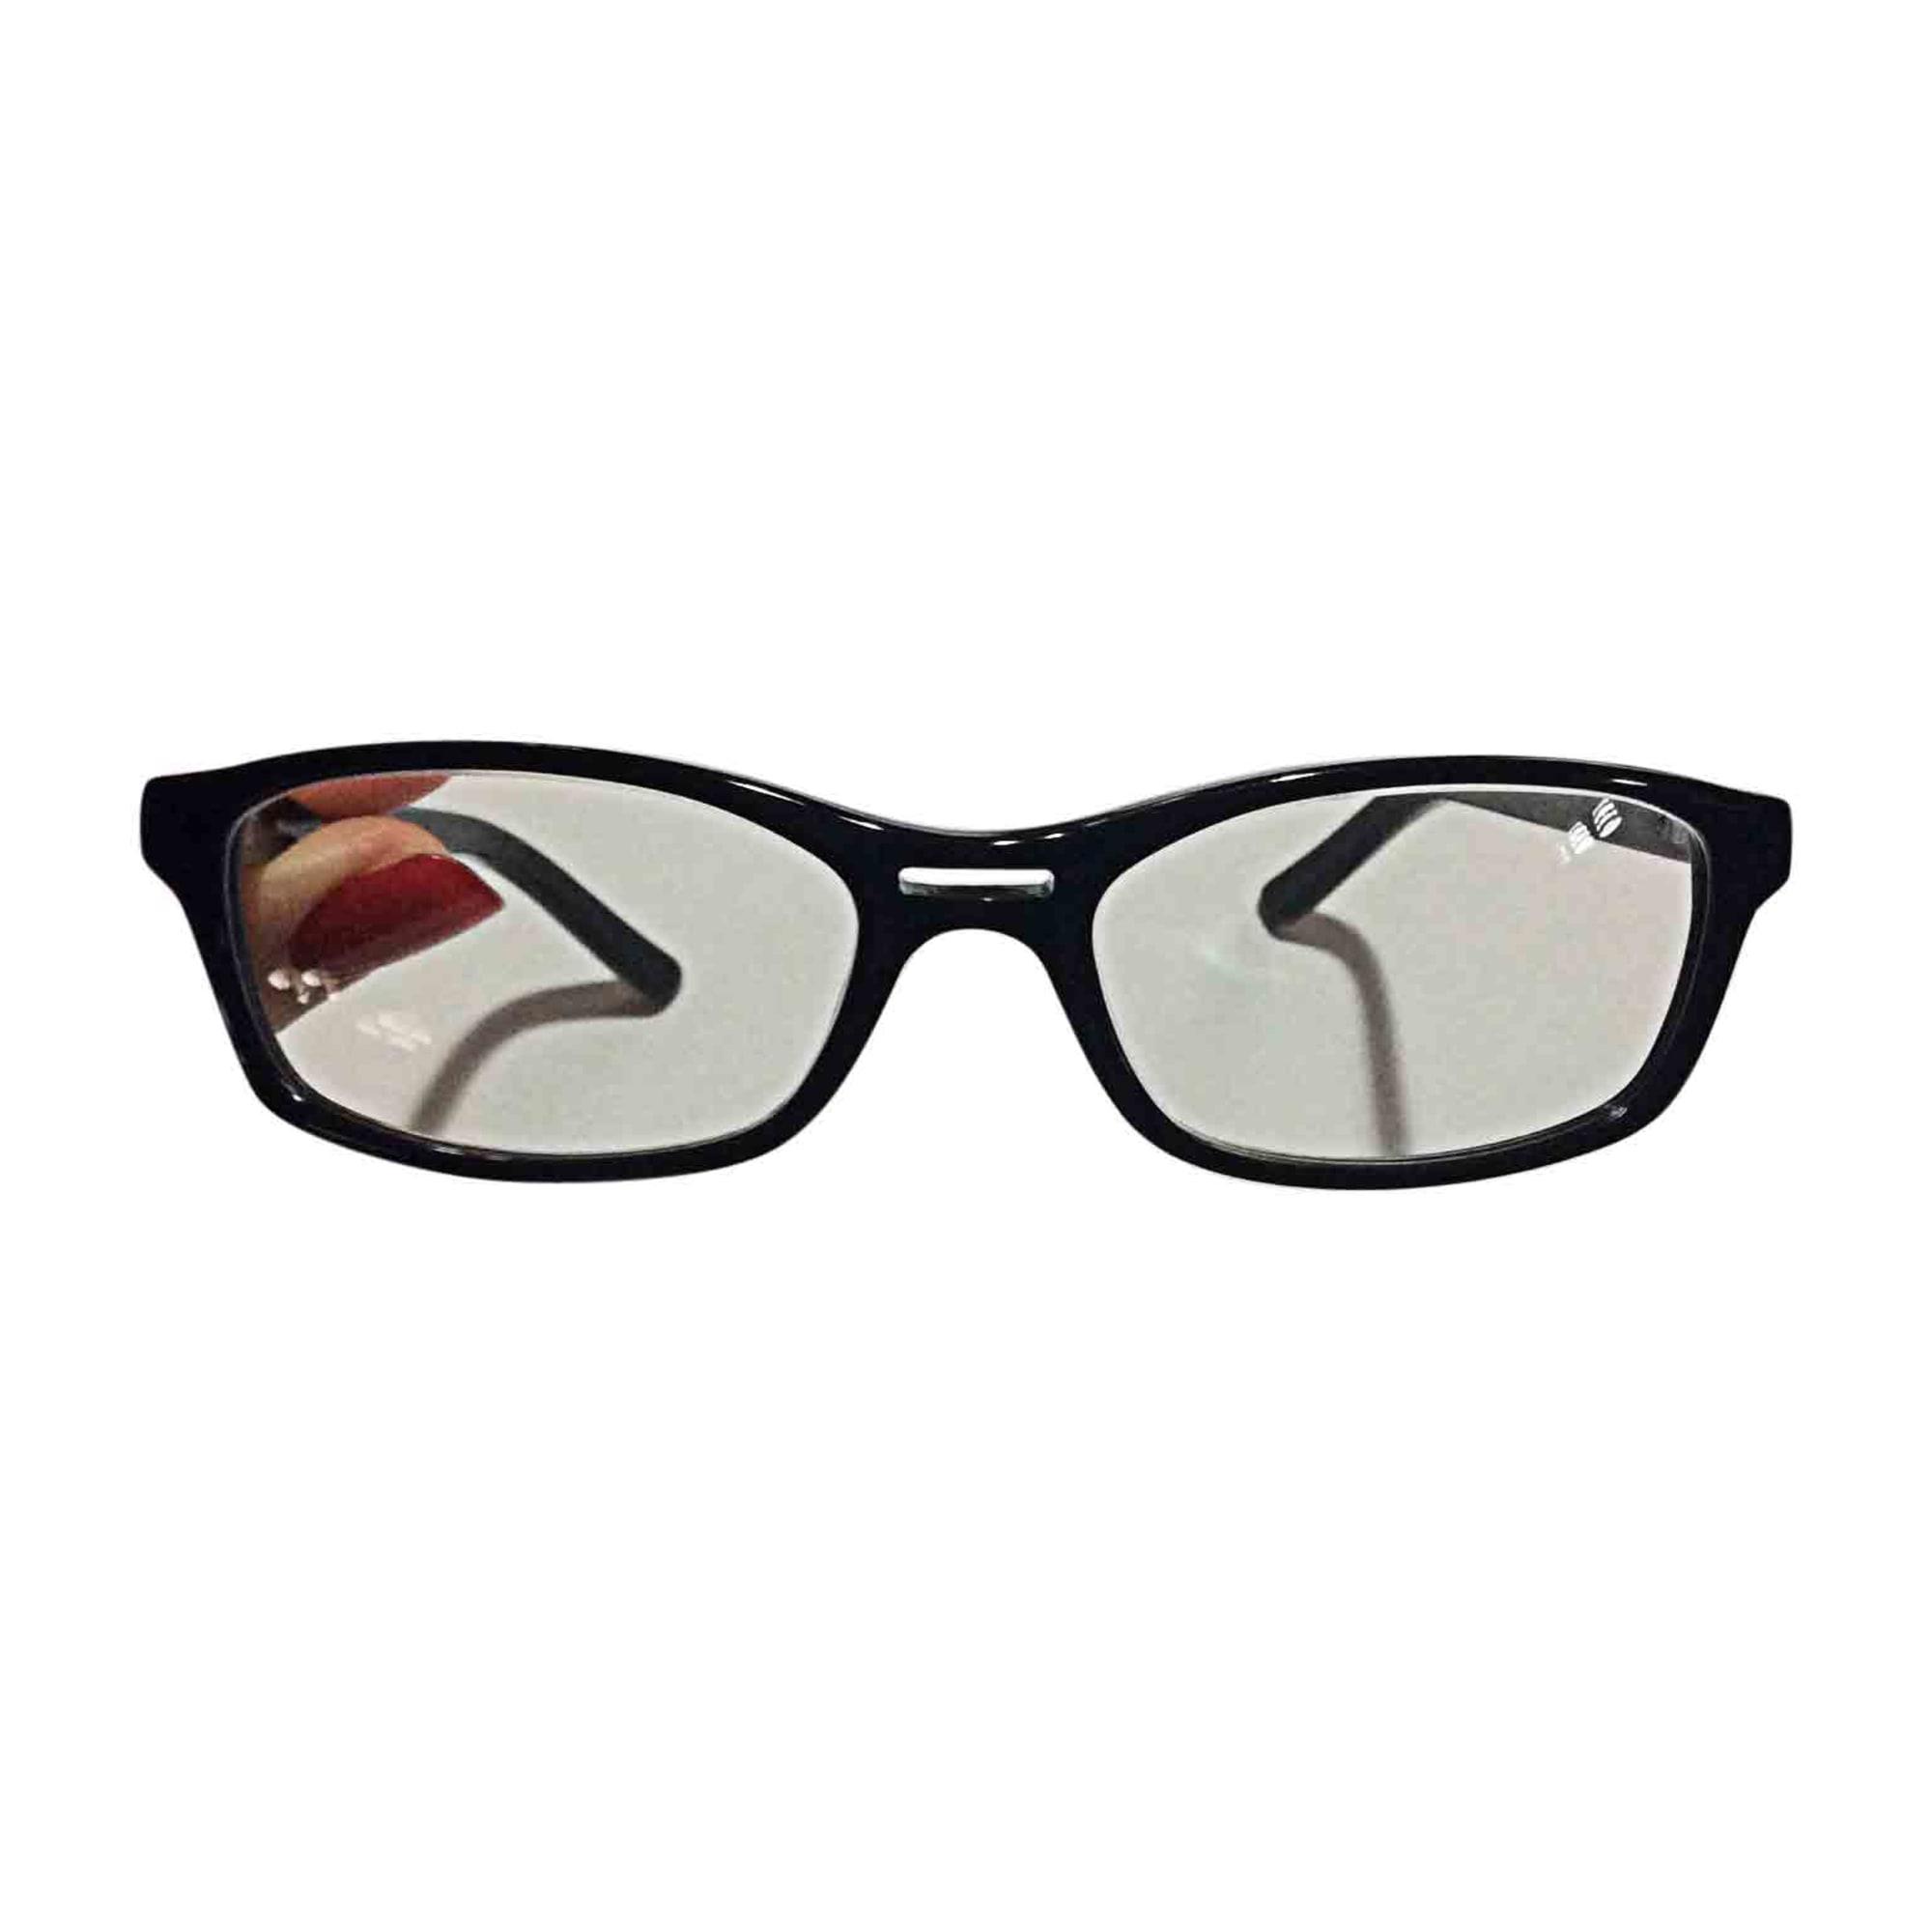 eyeglass frames burberry black 7009147